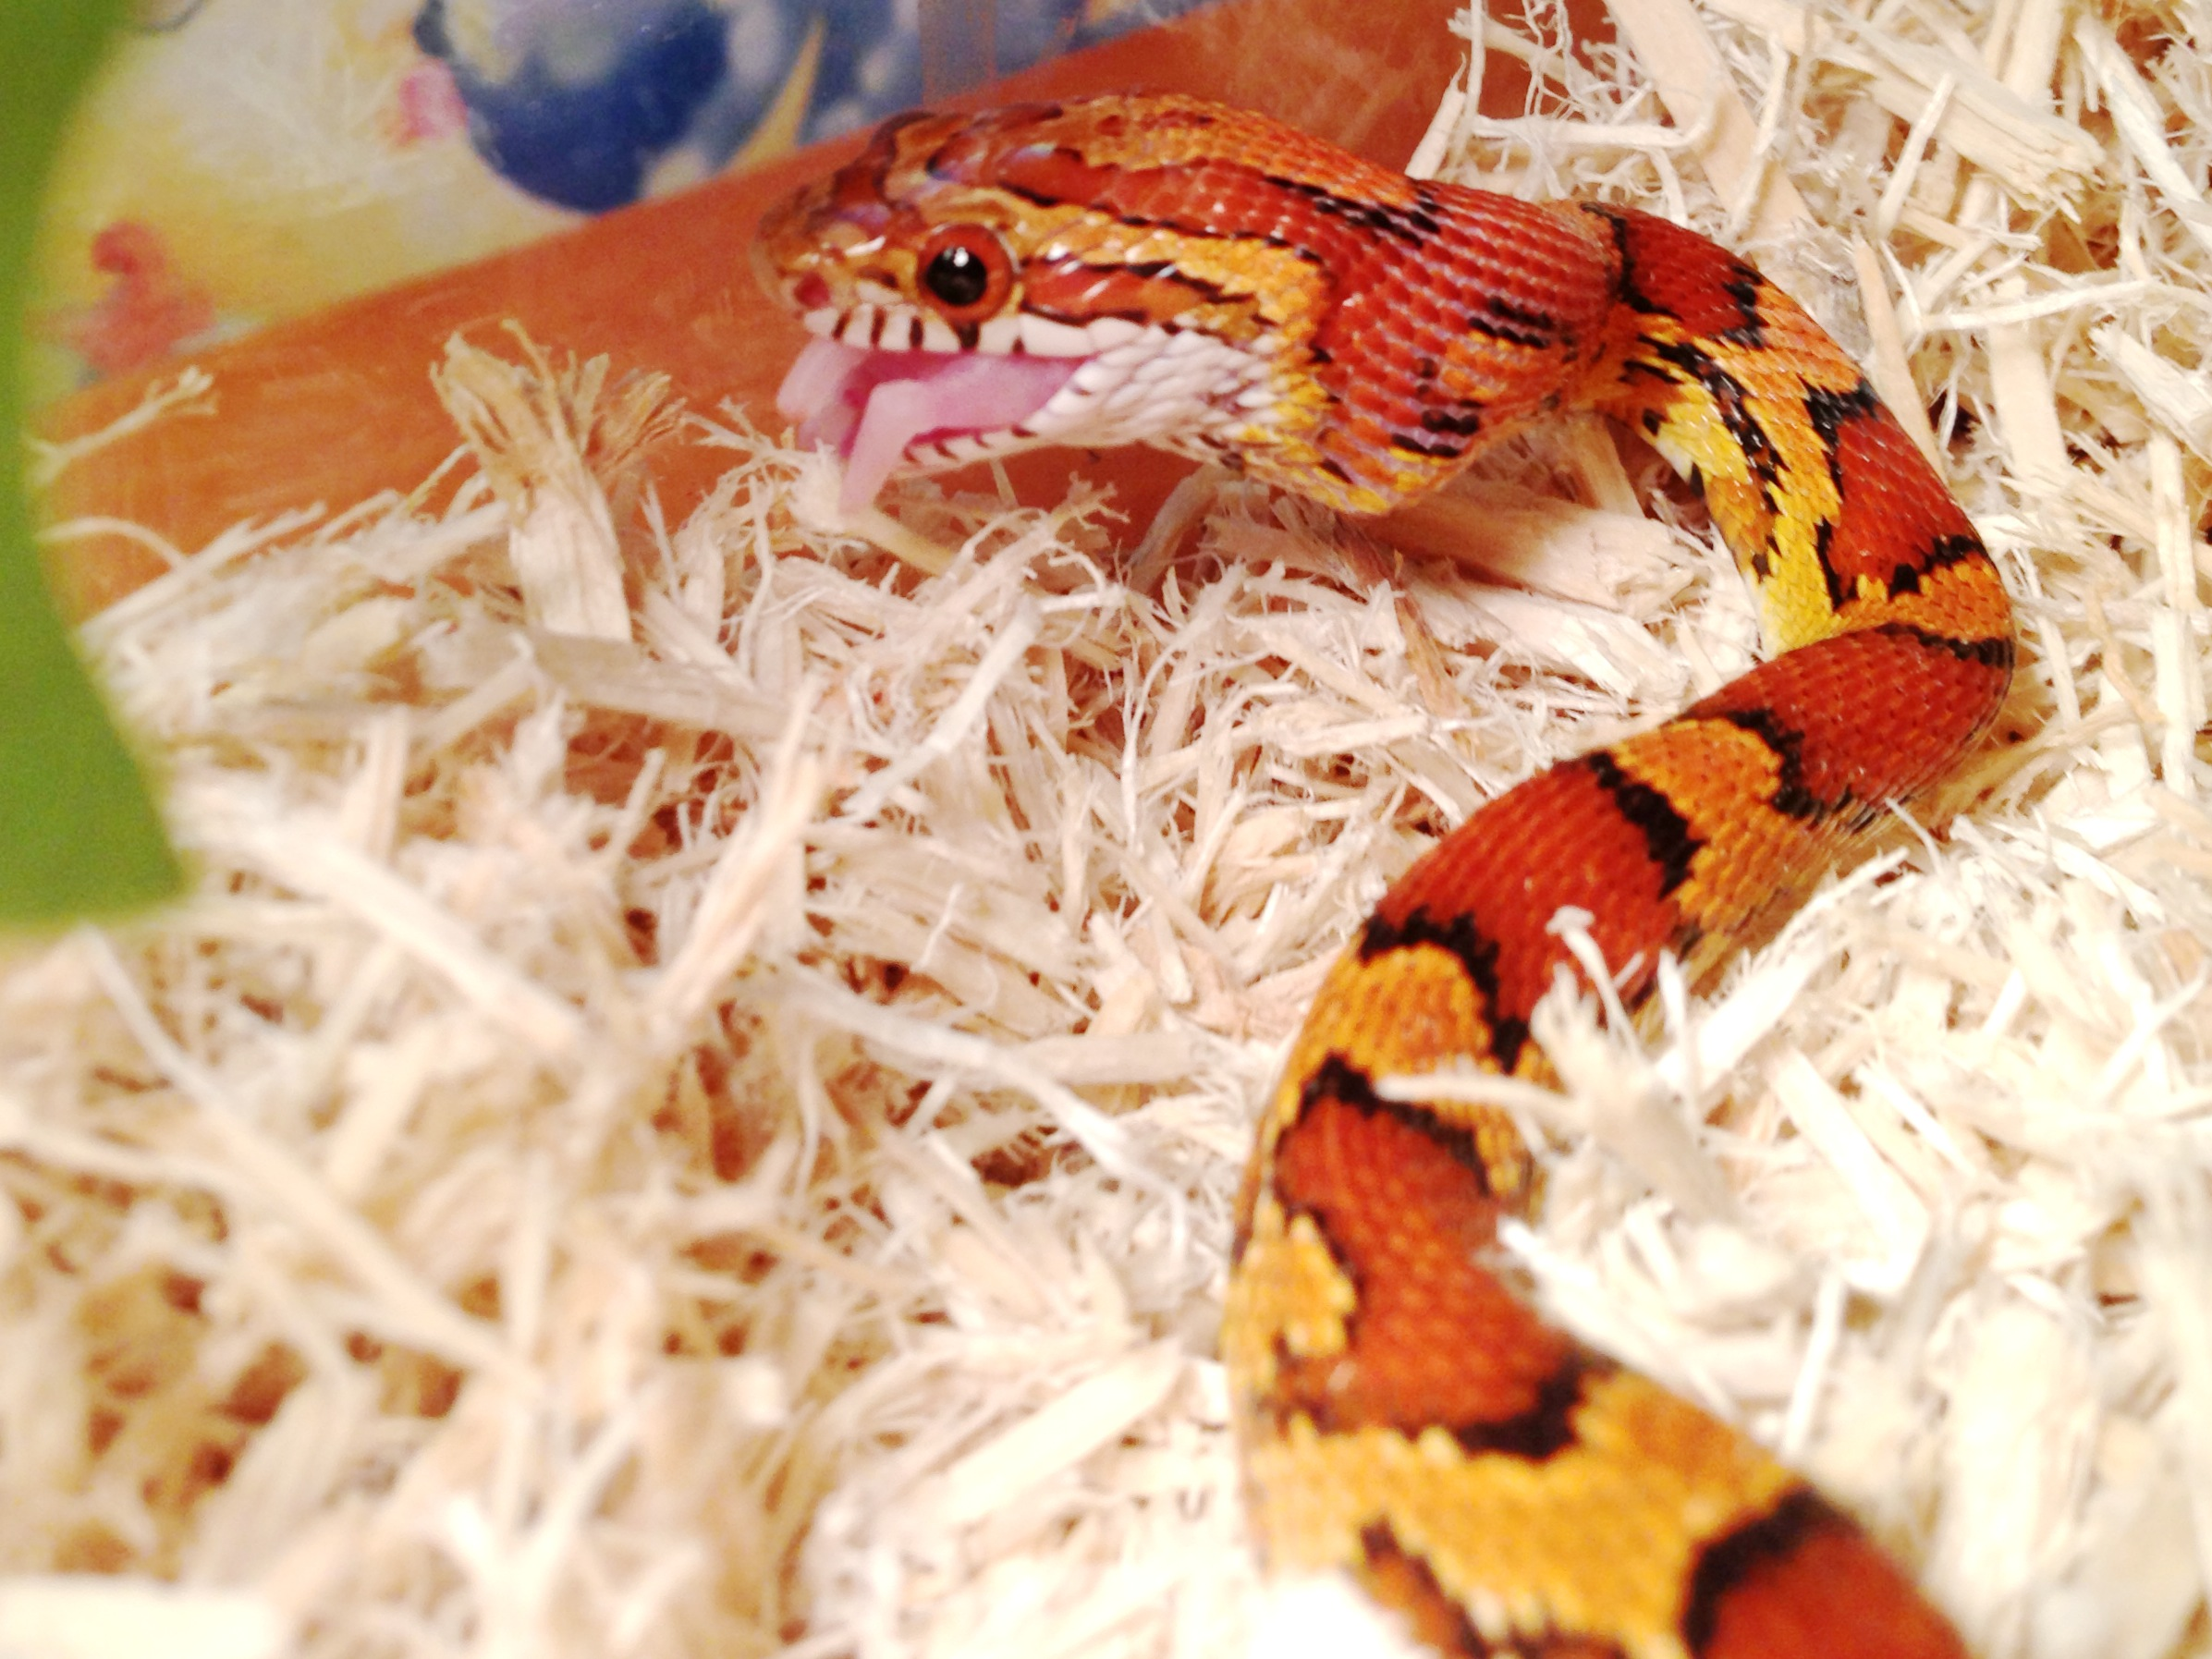 Kingsnakecom Classifieds gt Corn Snake Classifieds